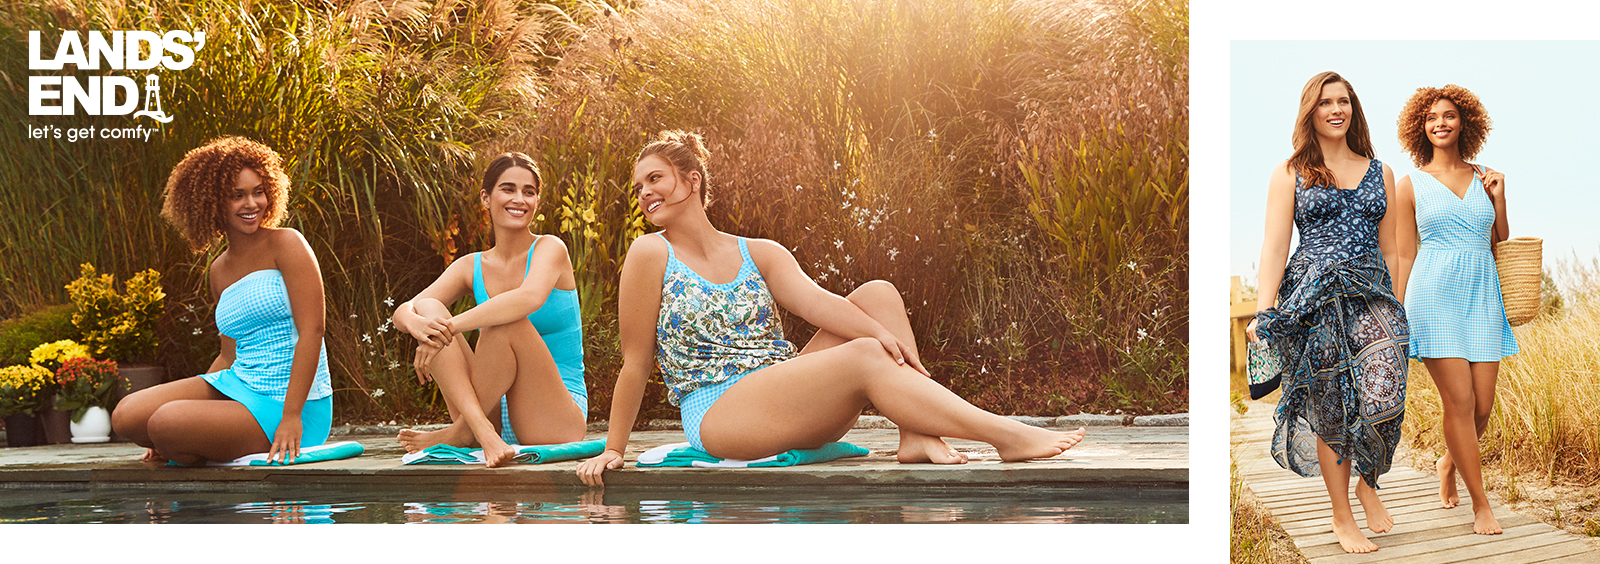 Stylish Swimwear for Your Backyard Pool Party